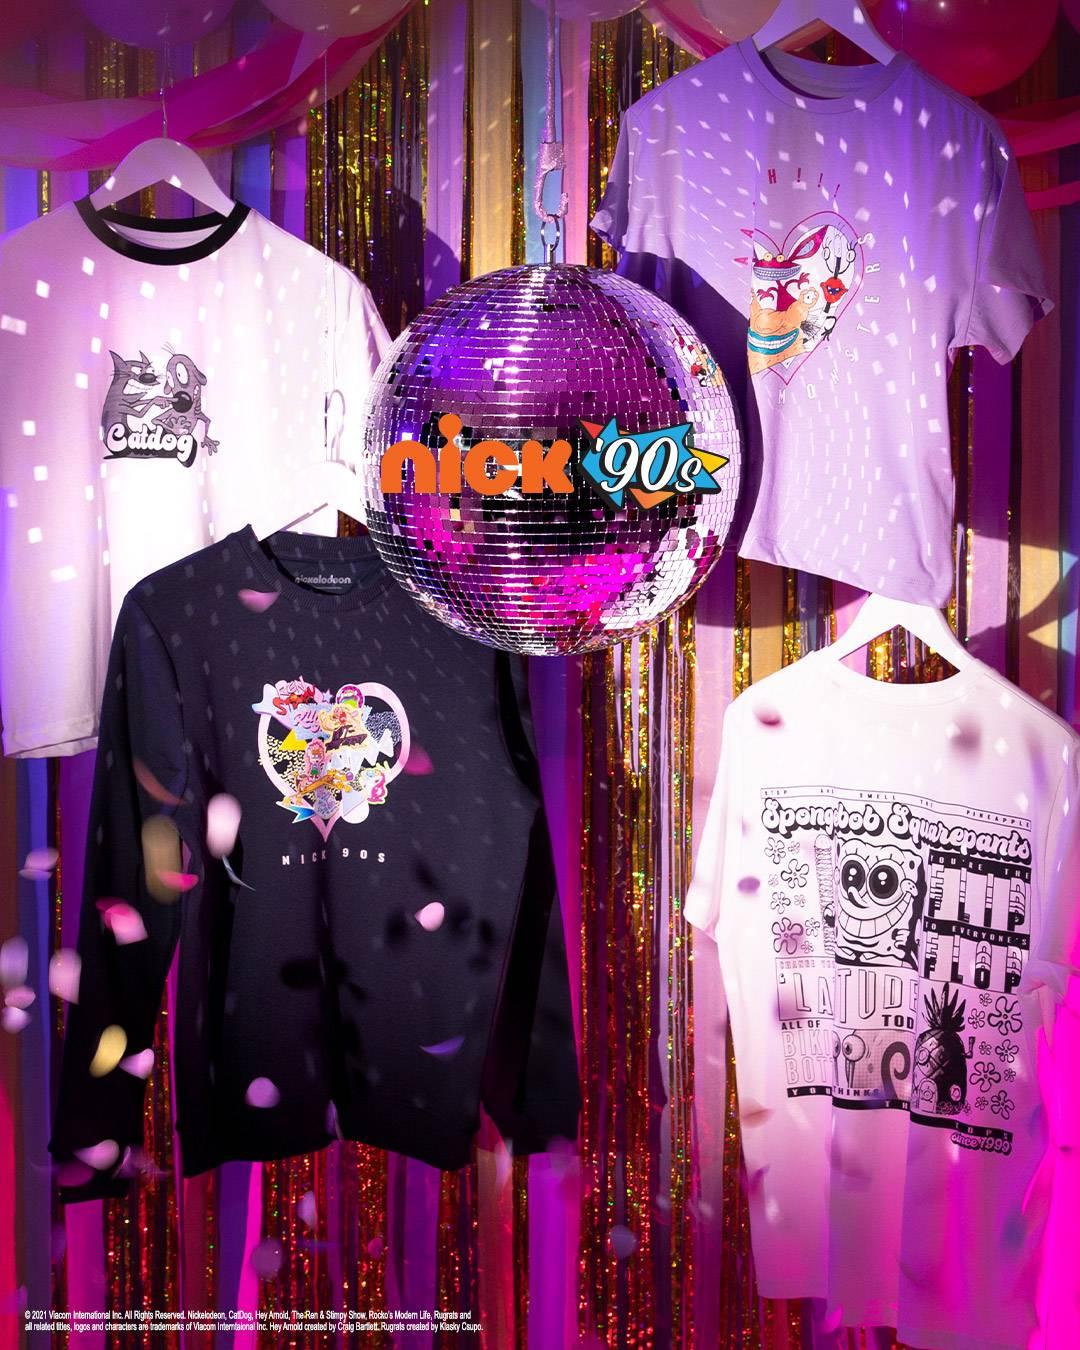 Nick 90's collection, coming soon to VeryNeko